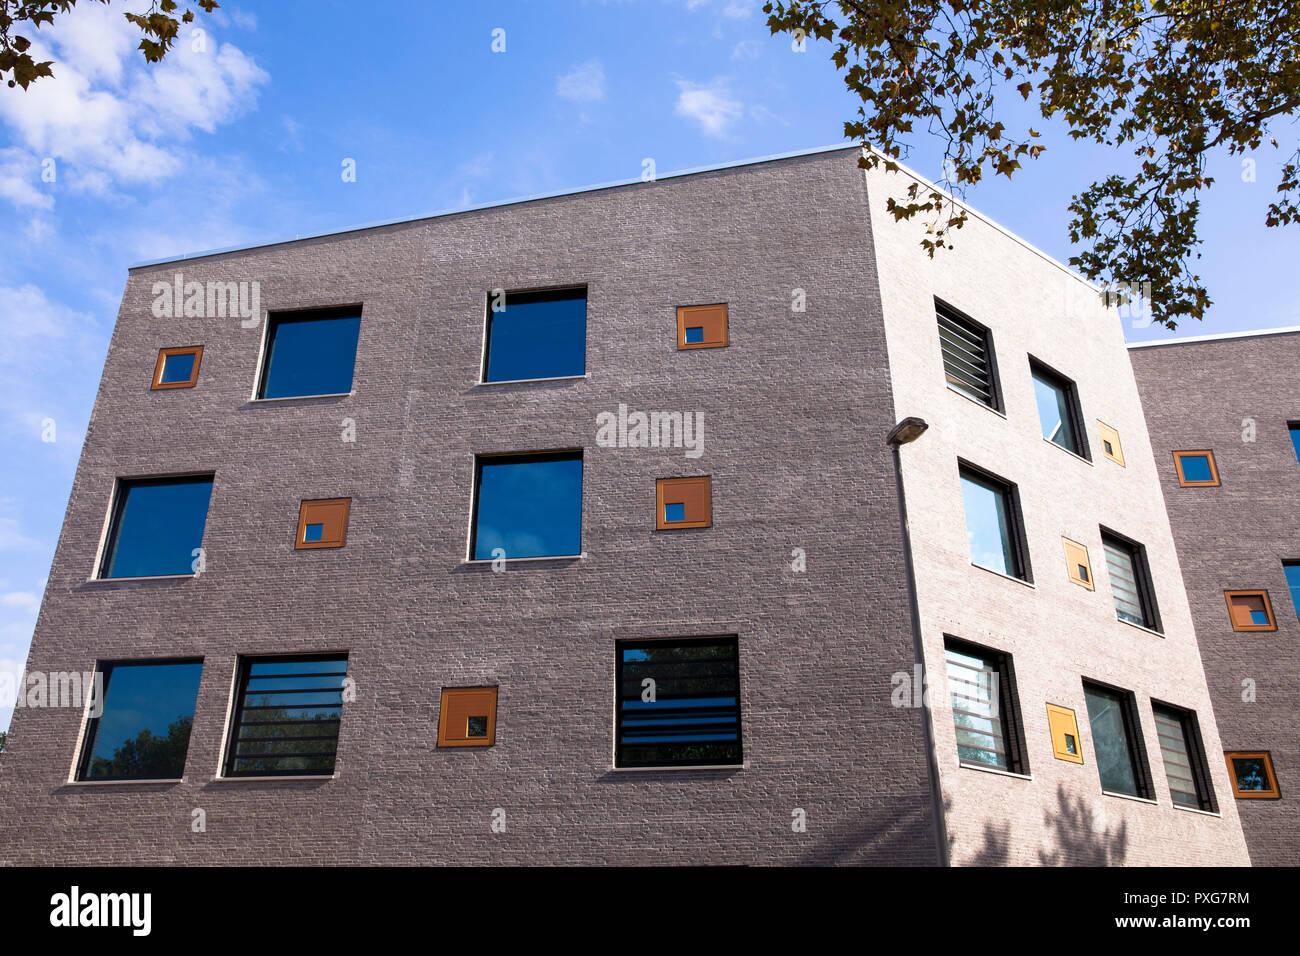 building of the school campus Bildungslandschaft Altstadt Nord (BAN) near the Klingelpuetz park, architect Gernot Schulz, Cologne, Germany.  Gebaeude  - Stock Image